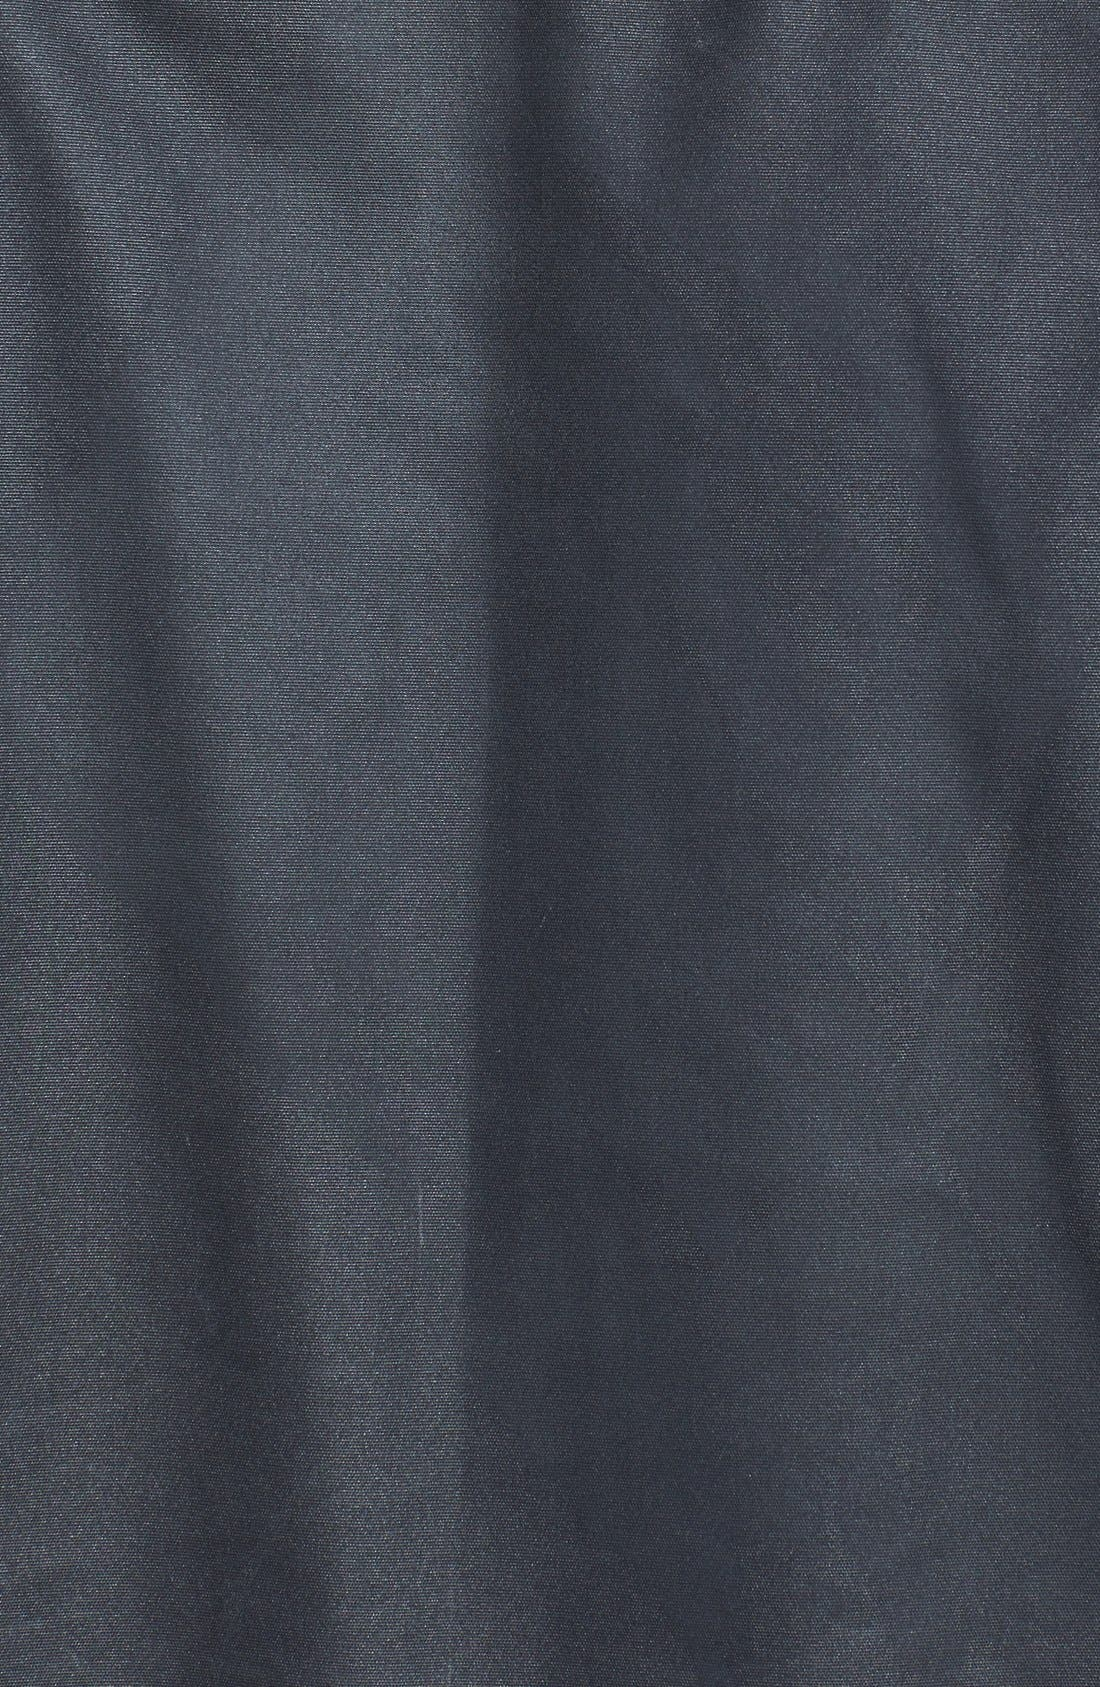 Alternate Image 3  - Helly Hansen 'Robson' Waxed Surface Waterproof & Windproof Jacket